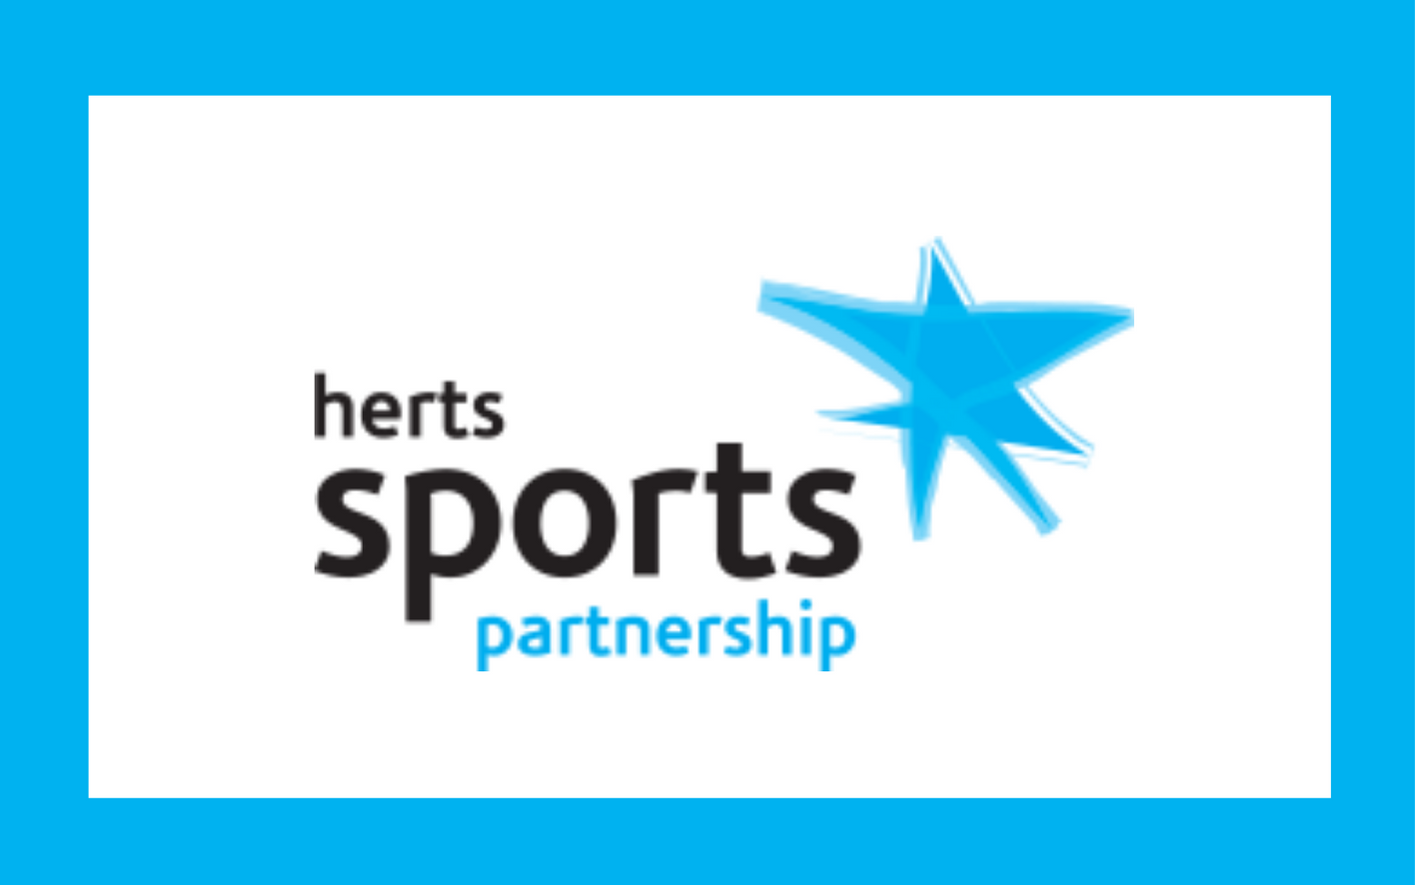 HERTS SPORTS PARTNERSHIP